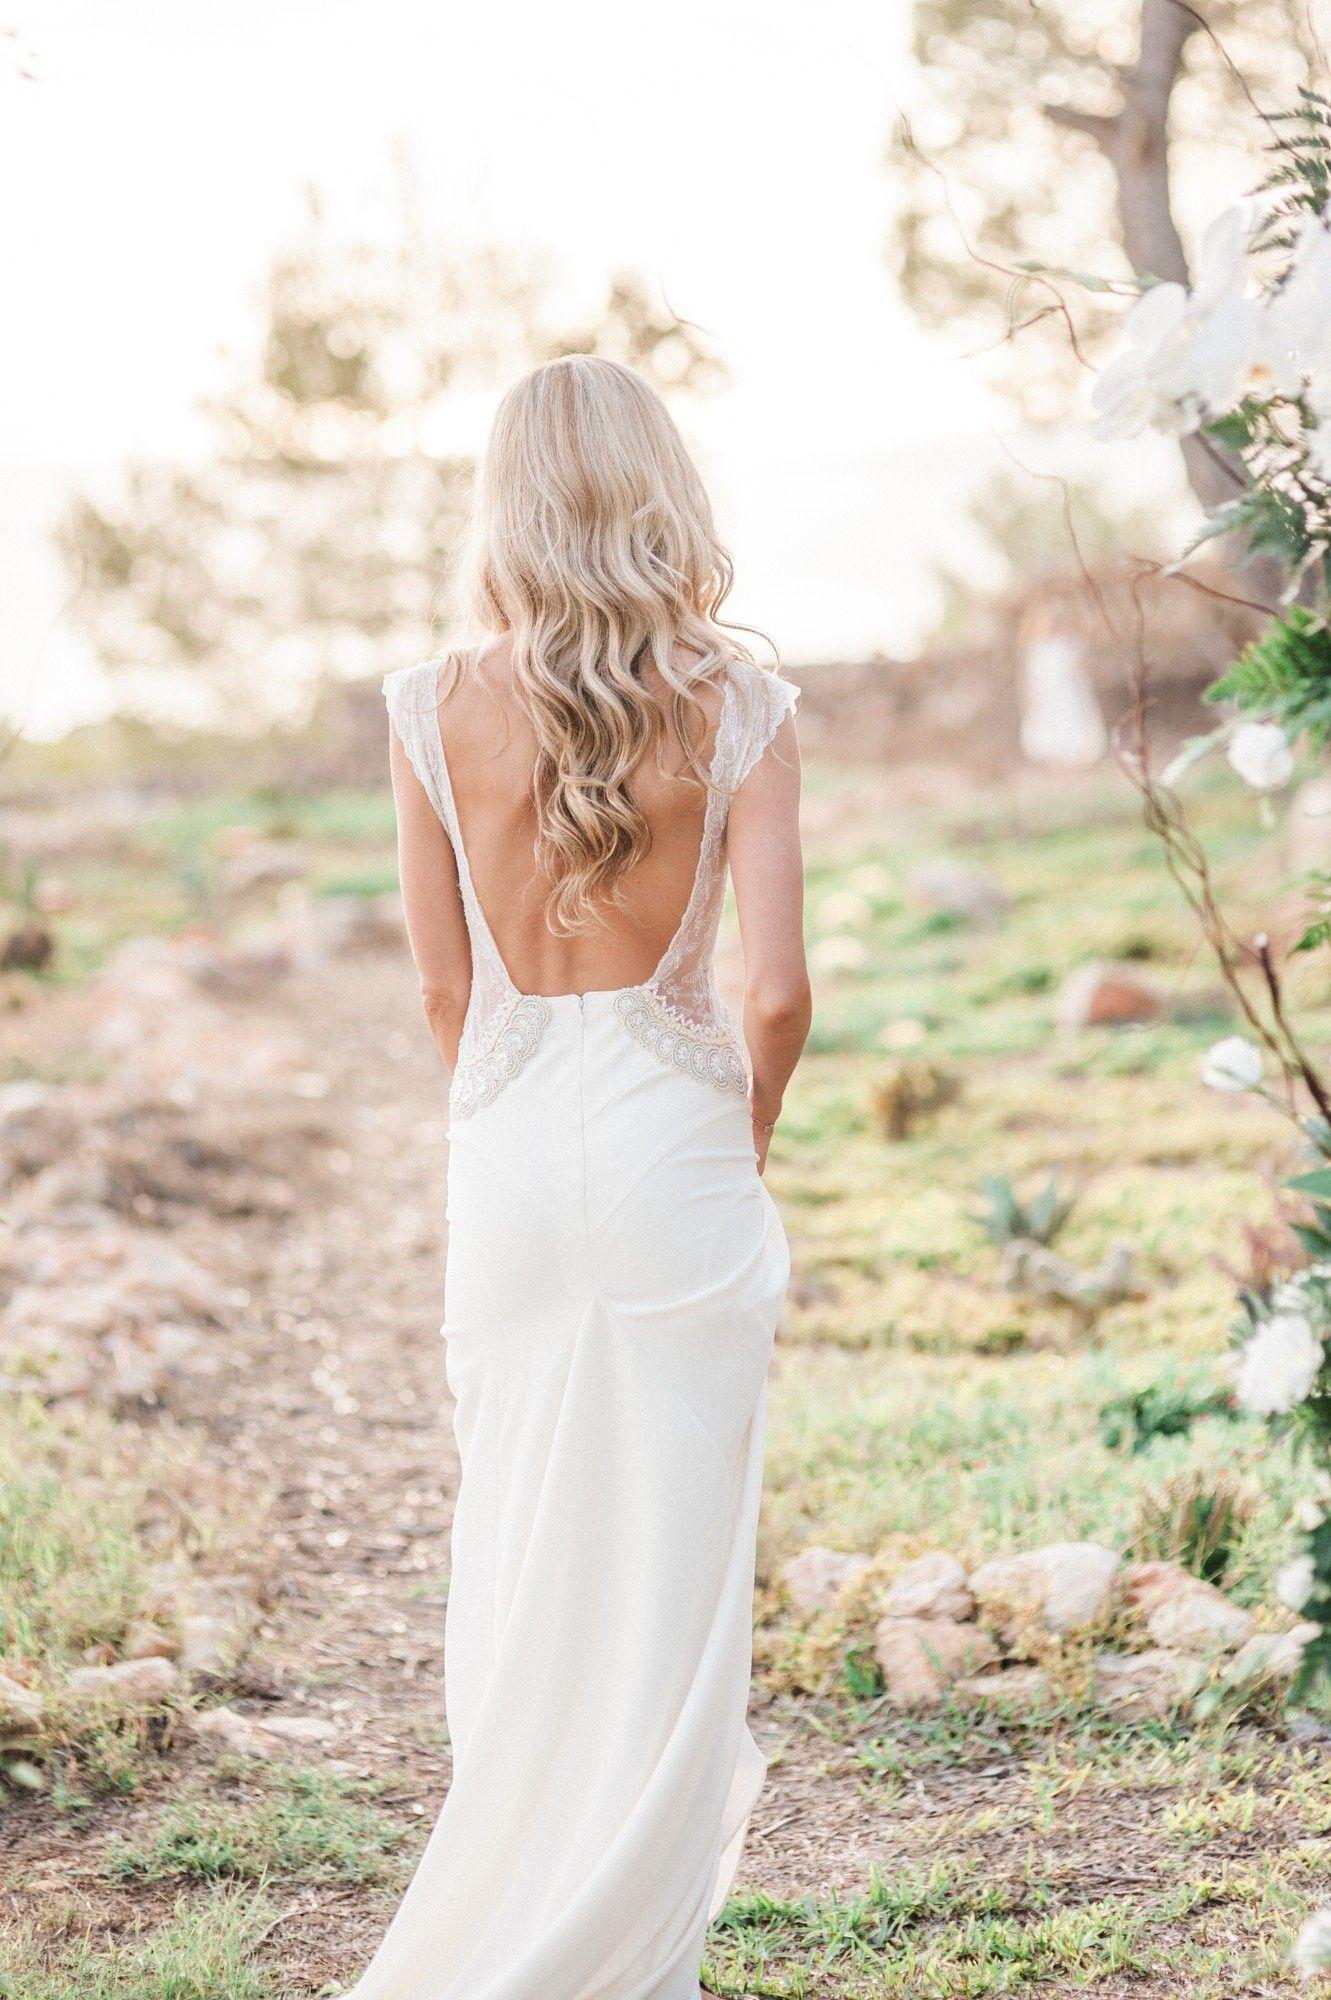 Inbal dror 15 27 size 8 wedding dress inbal dror french lace inbal dror 15 27 pre owned wedding dress still white australia ombrellifo Image collections